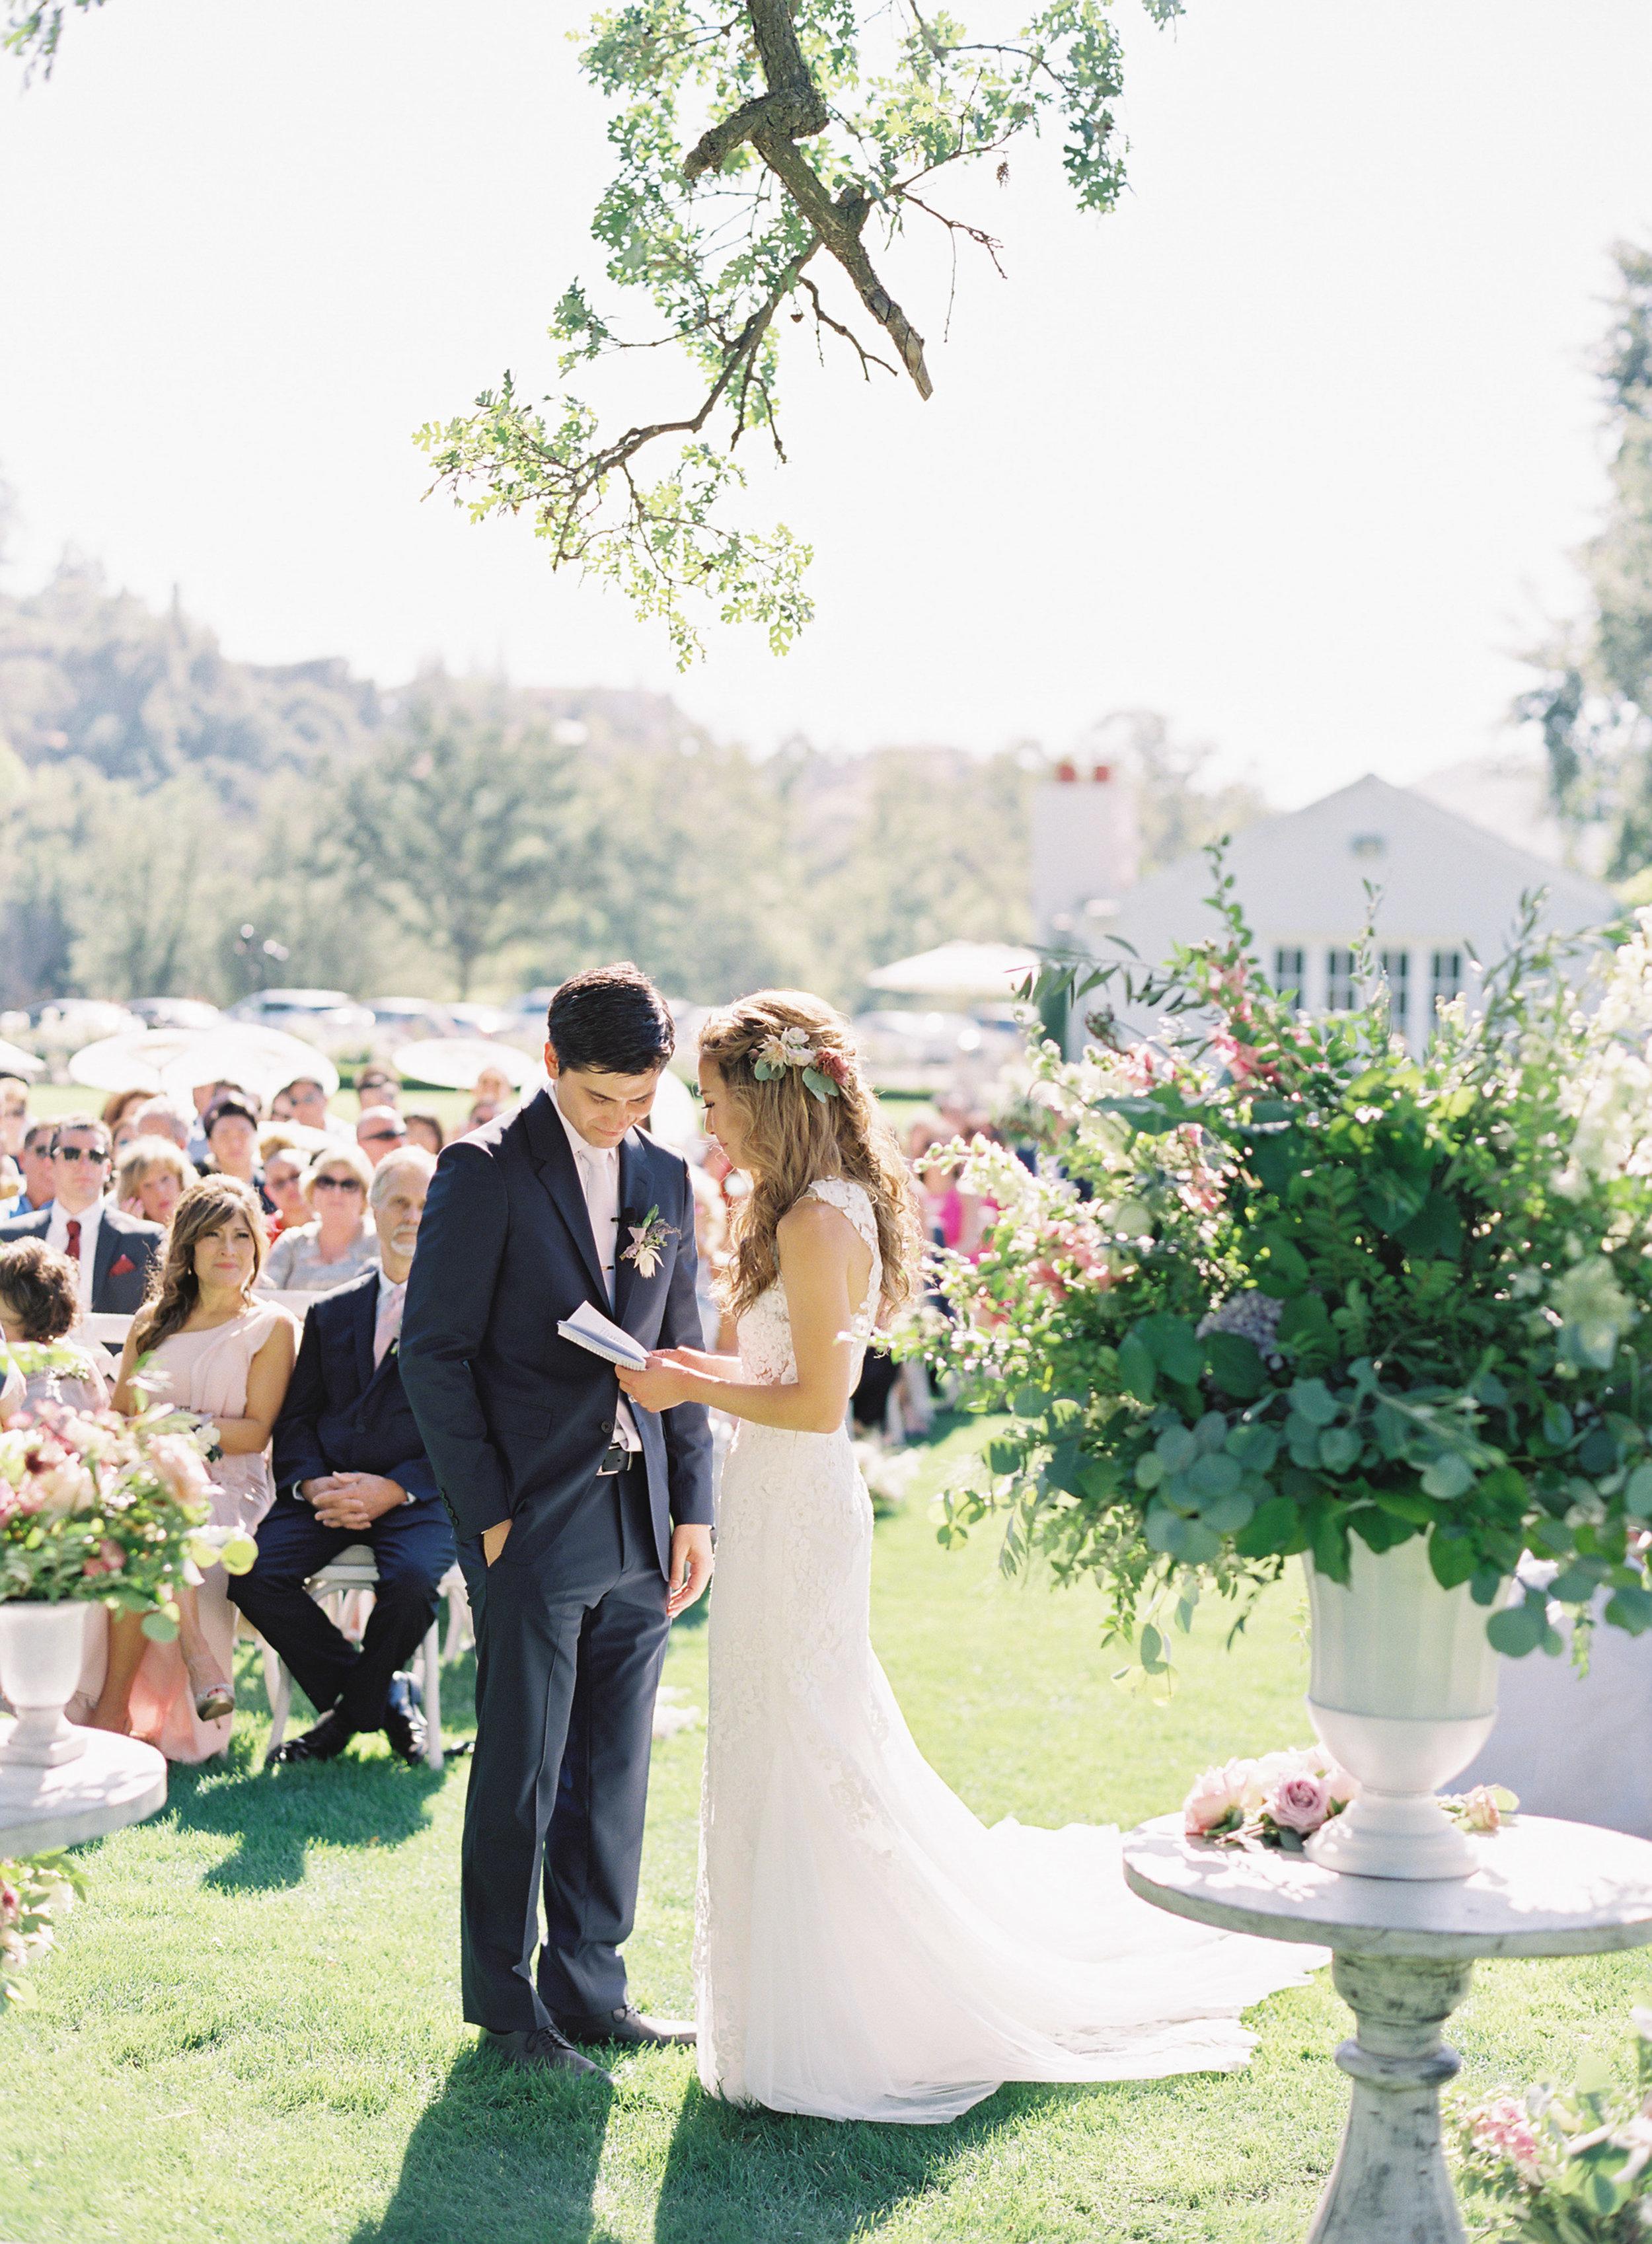 Triunfo_Creek_Winery_Wedding-91-Jen-Huang-JL-509-Jen-Huang-009976-R1-015.jpg